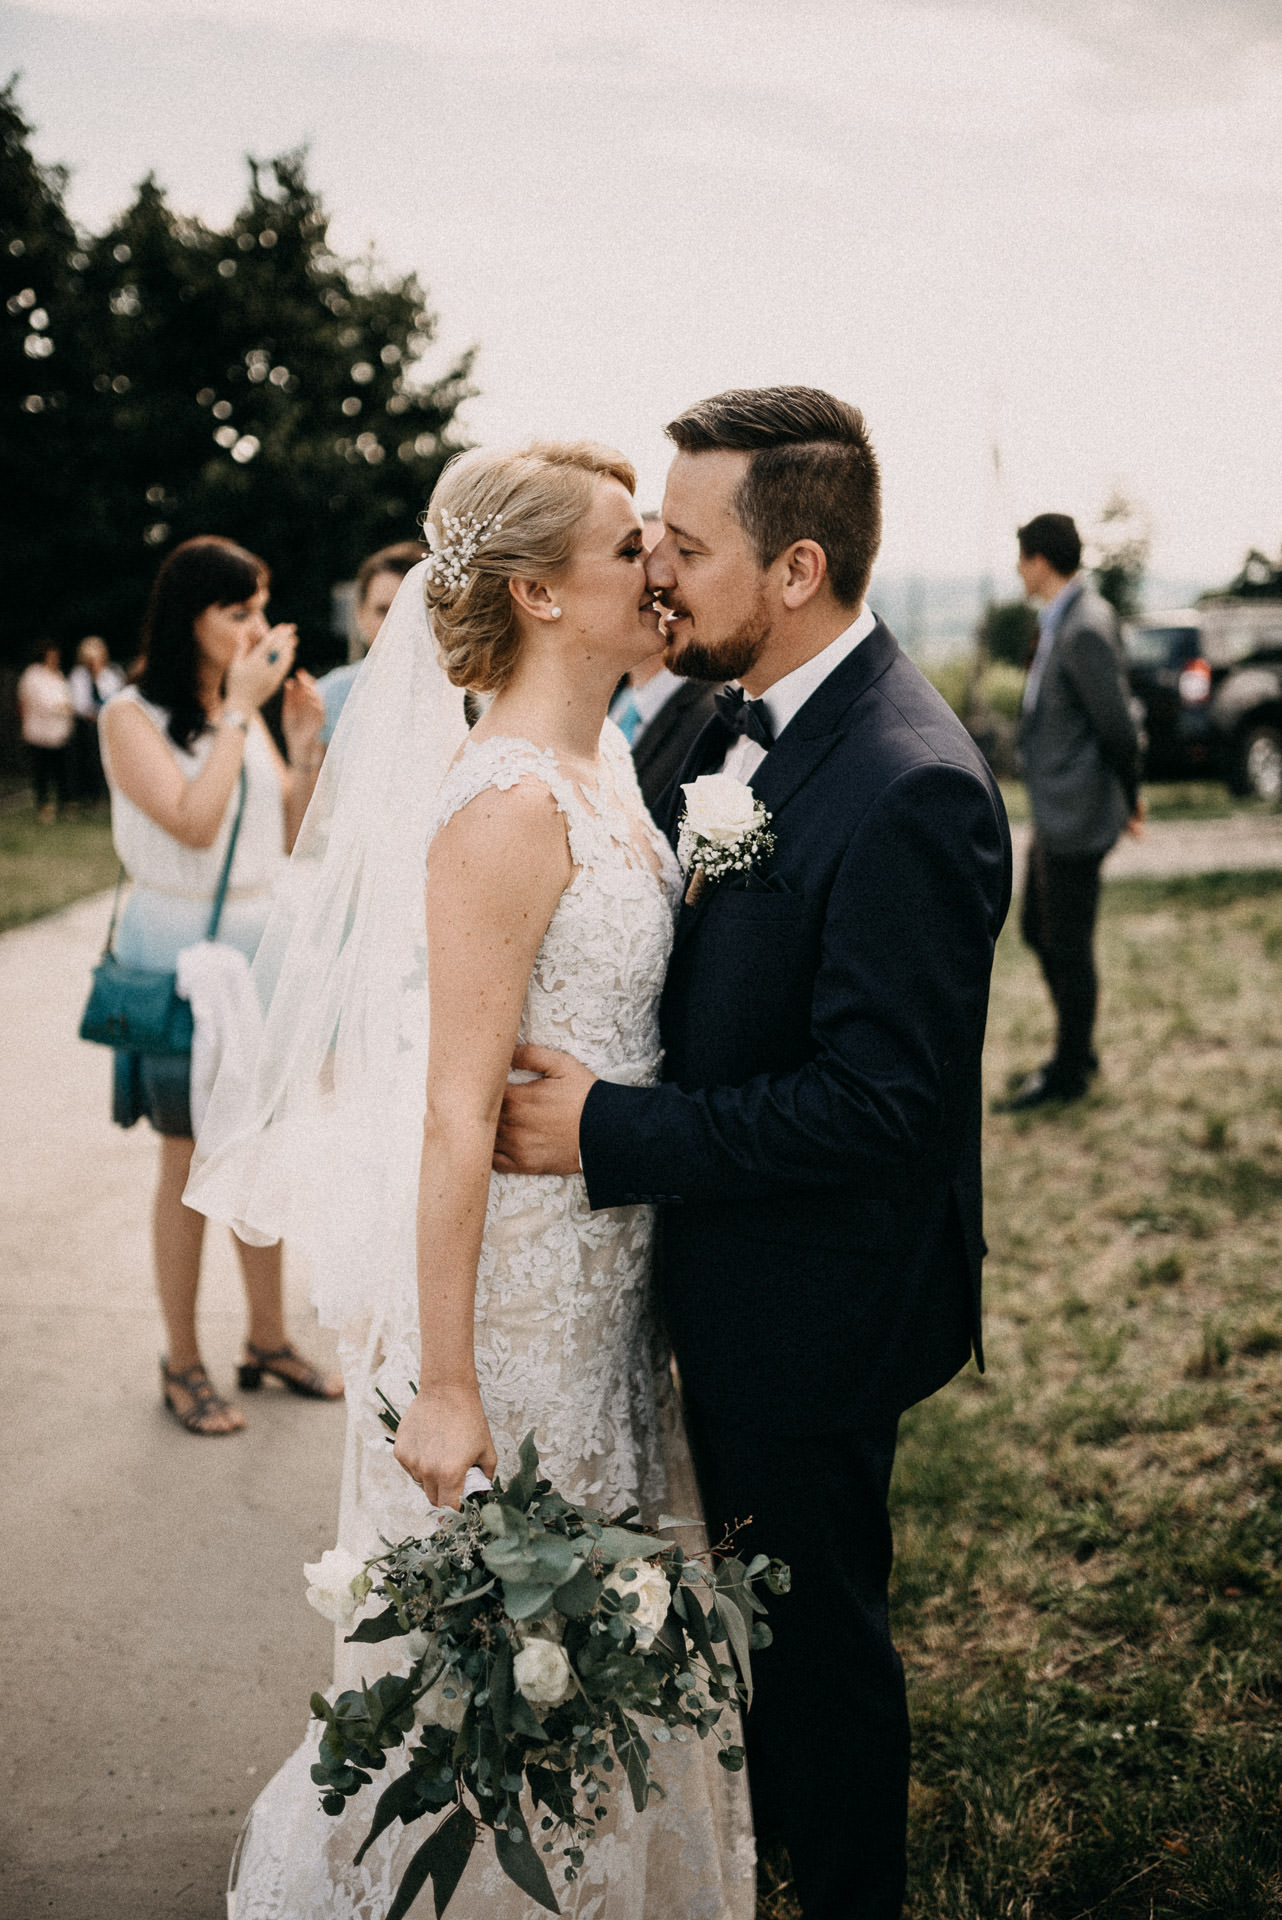 csok bride groom kiss volegeny menyasszony